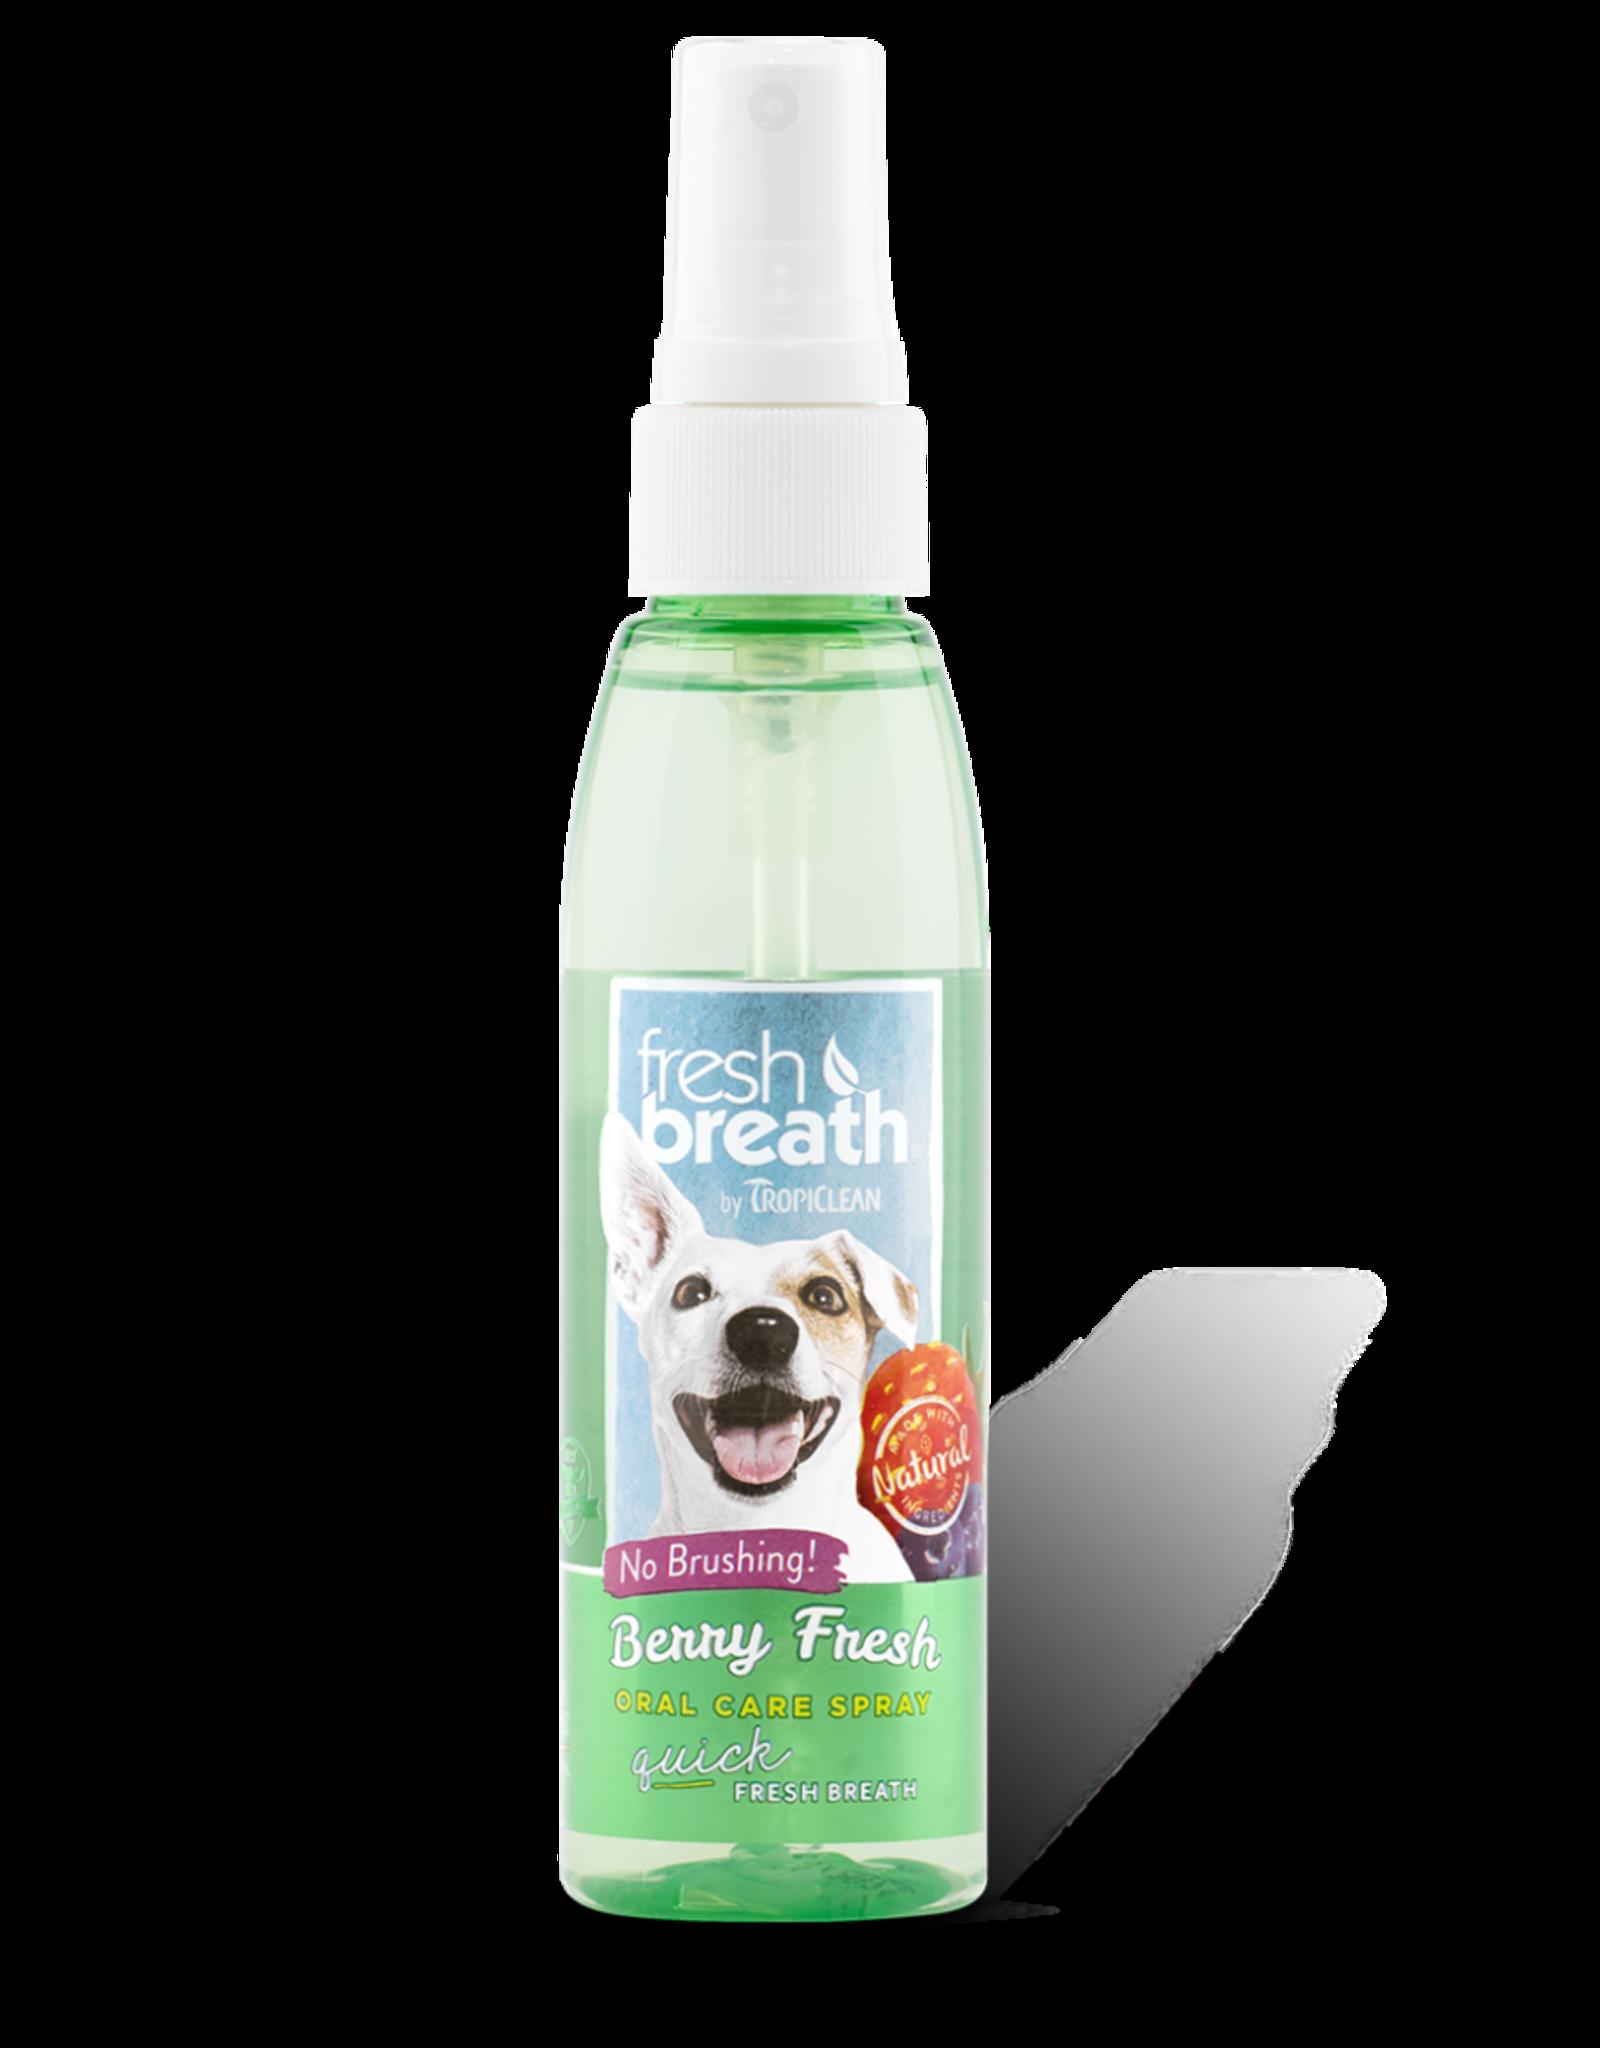 TropiClean TROPICLEAN DOG FRESH BREATH ORAL CARE SPRAY BERRY FRESH 4OZ